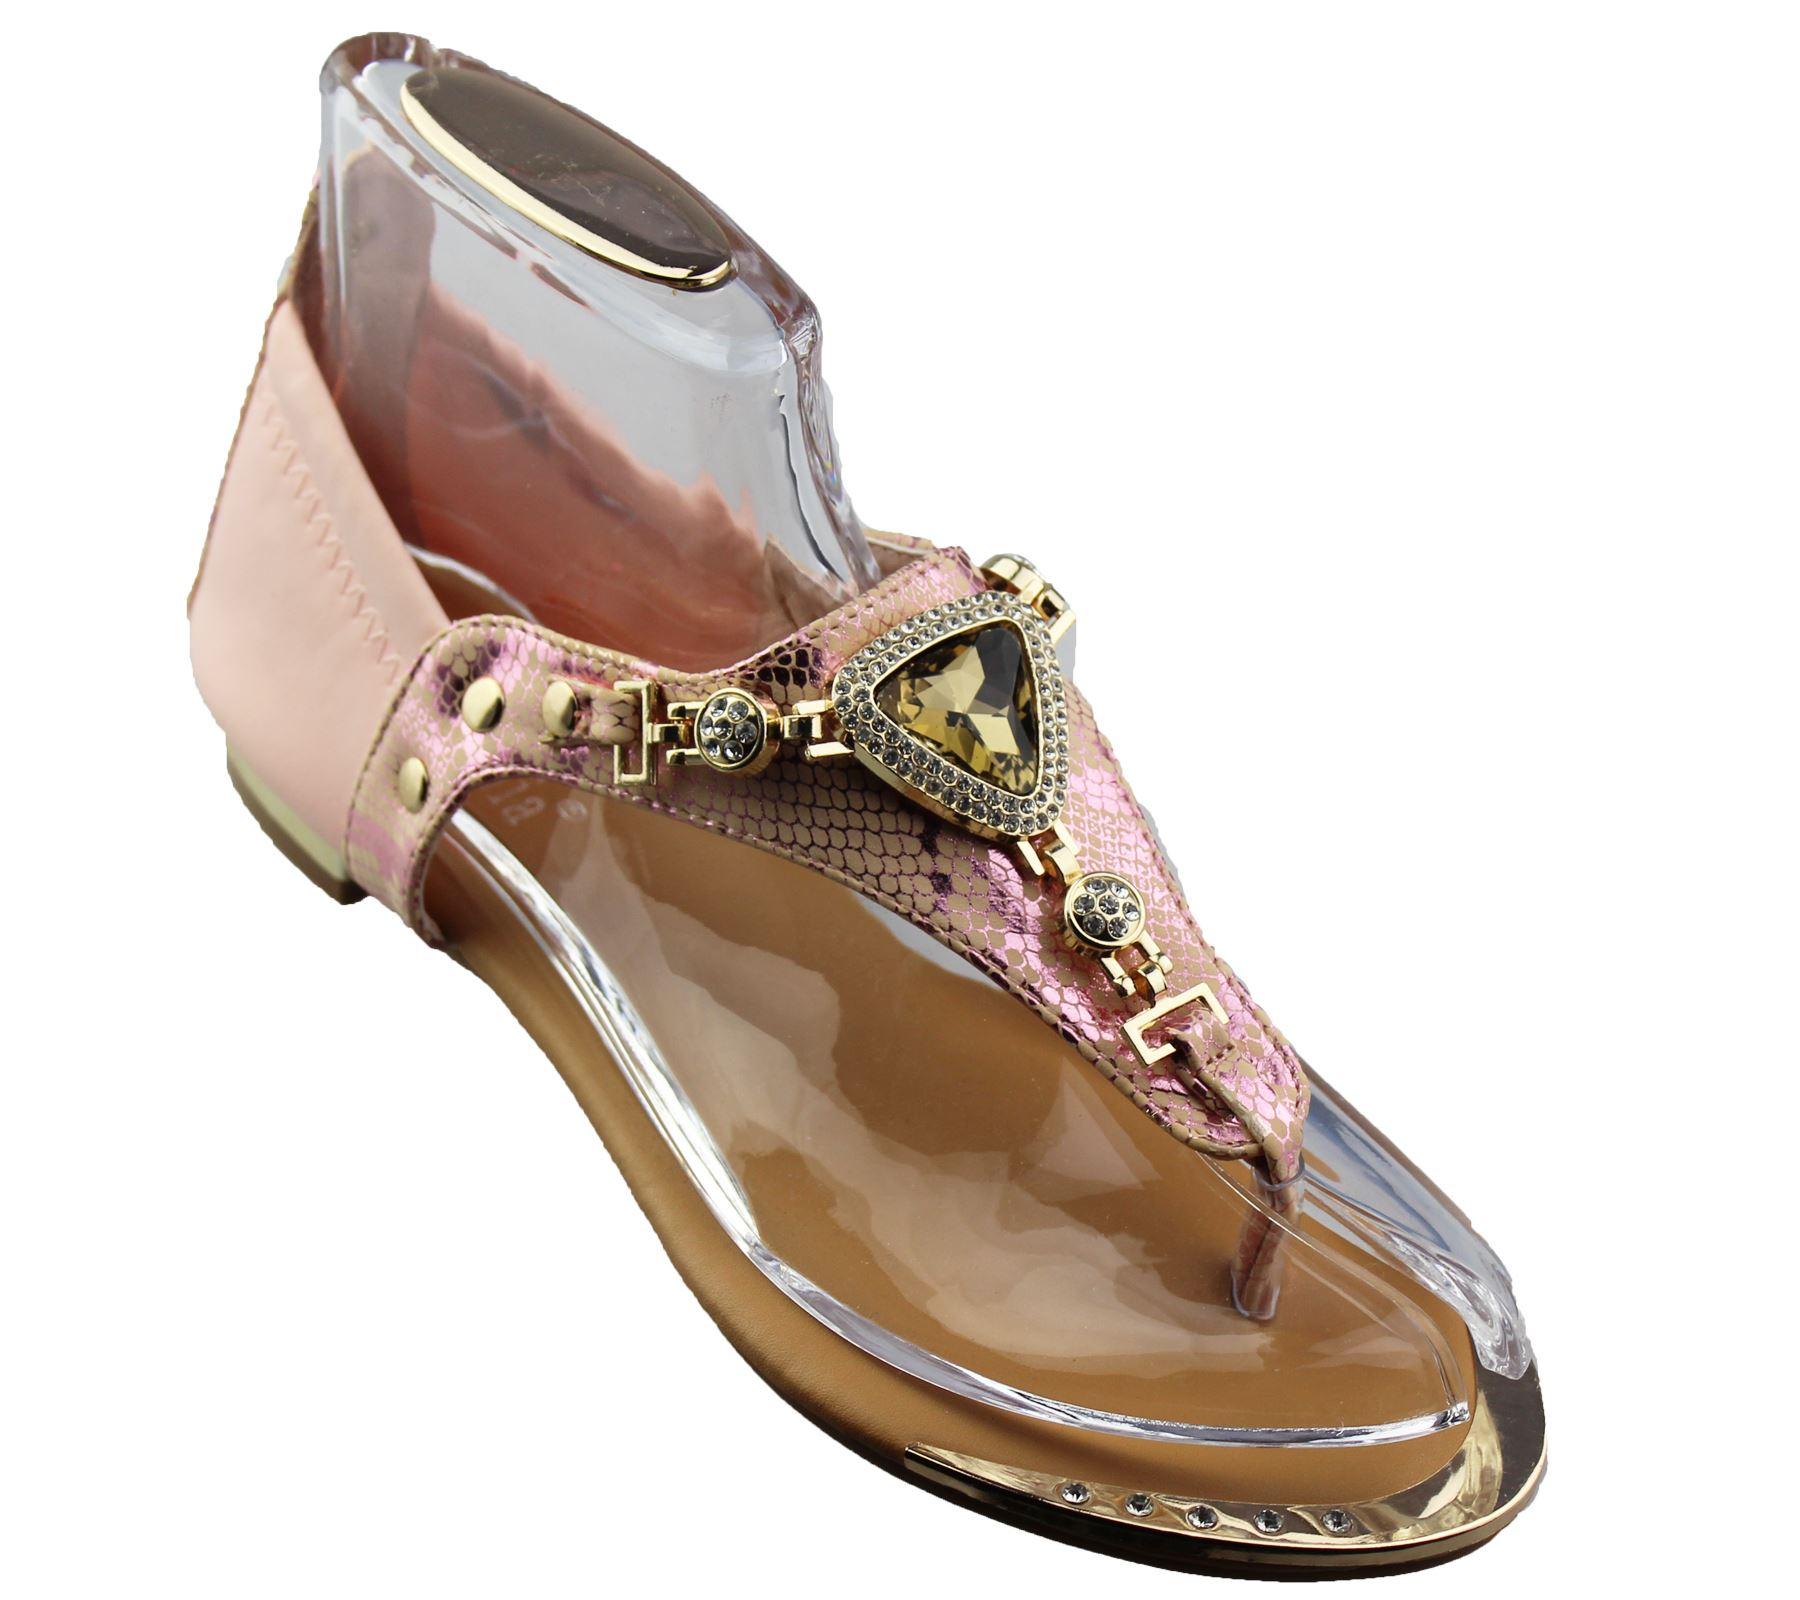 Womens-Flat-Summer-Sandals-Ladies-Diamante-Wedding-Toe-Post-Casual-Slipper thumbnail 31